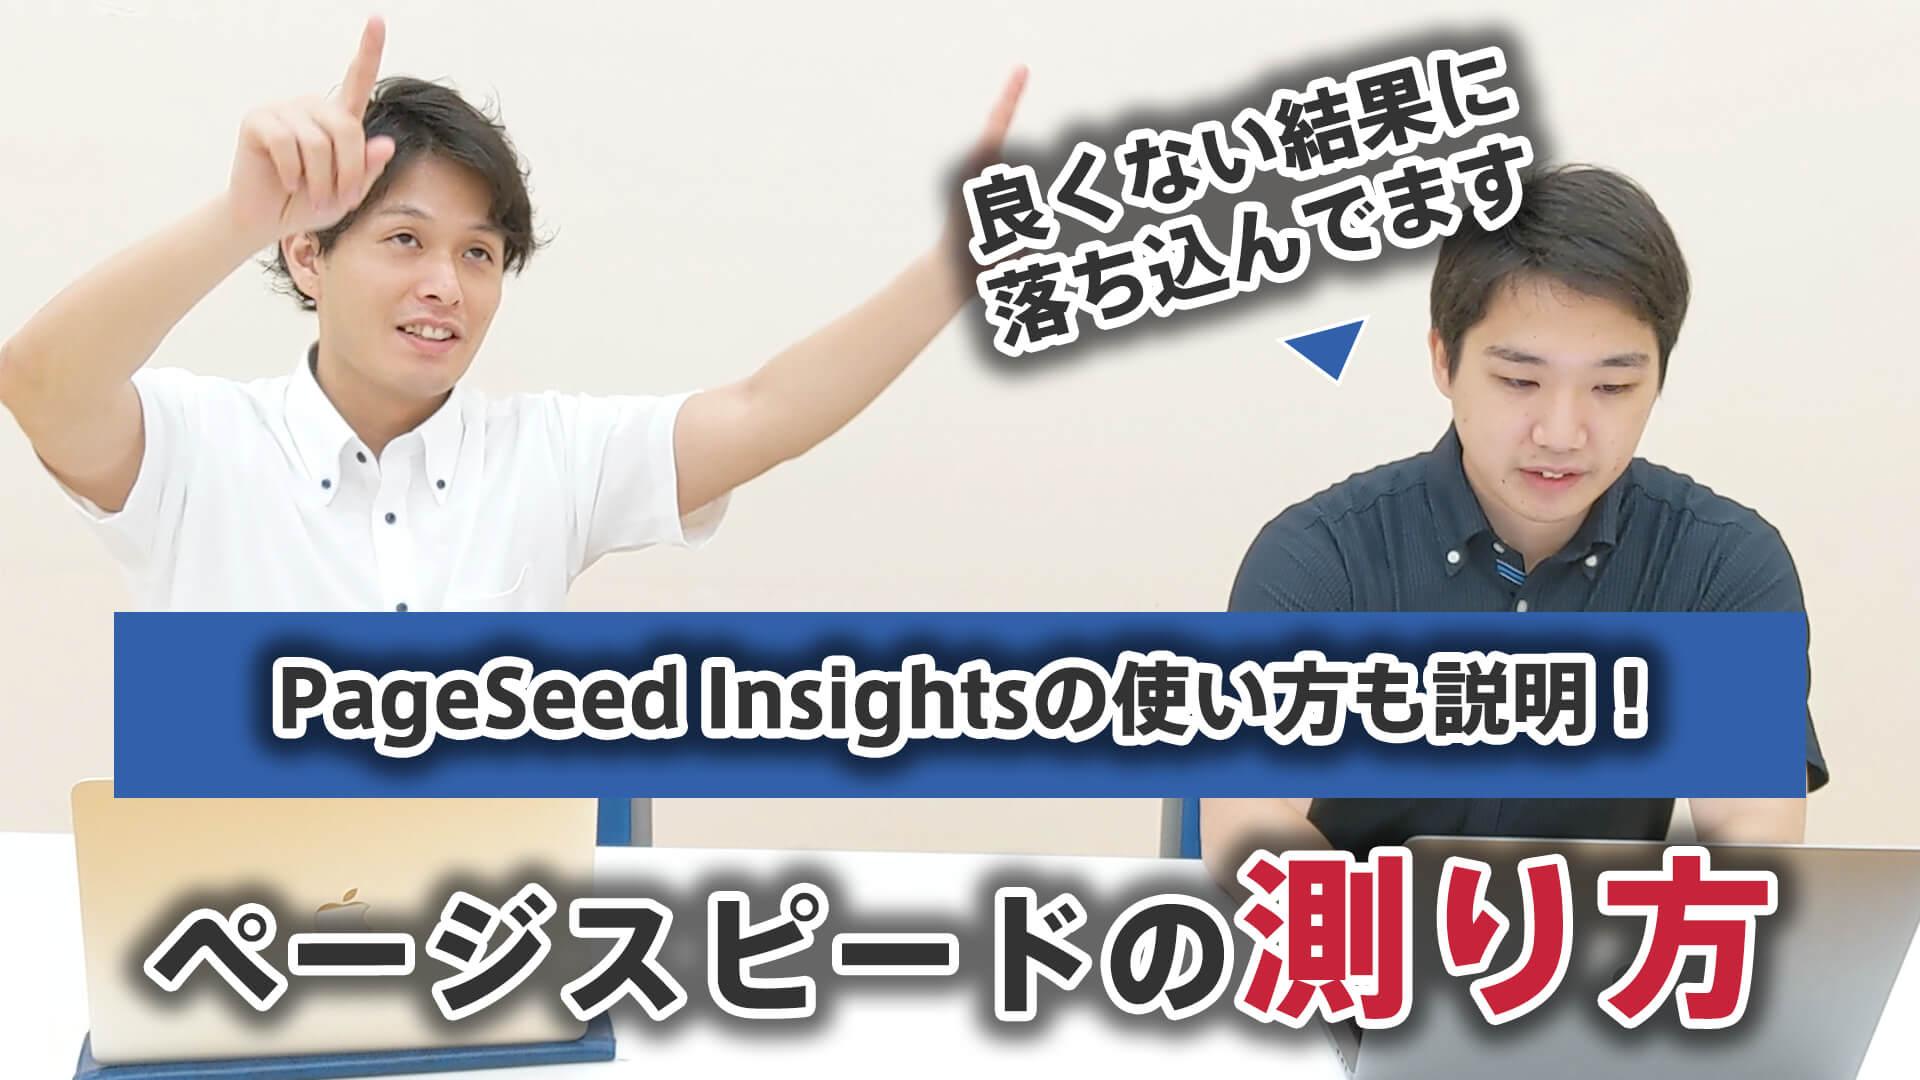 【PageSpeed Insights】ホームページ・ブログの表示速度の調べ方